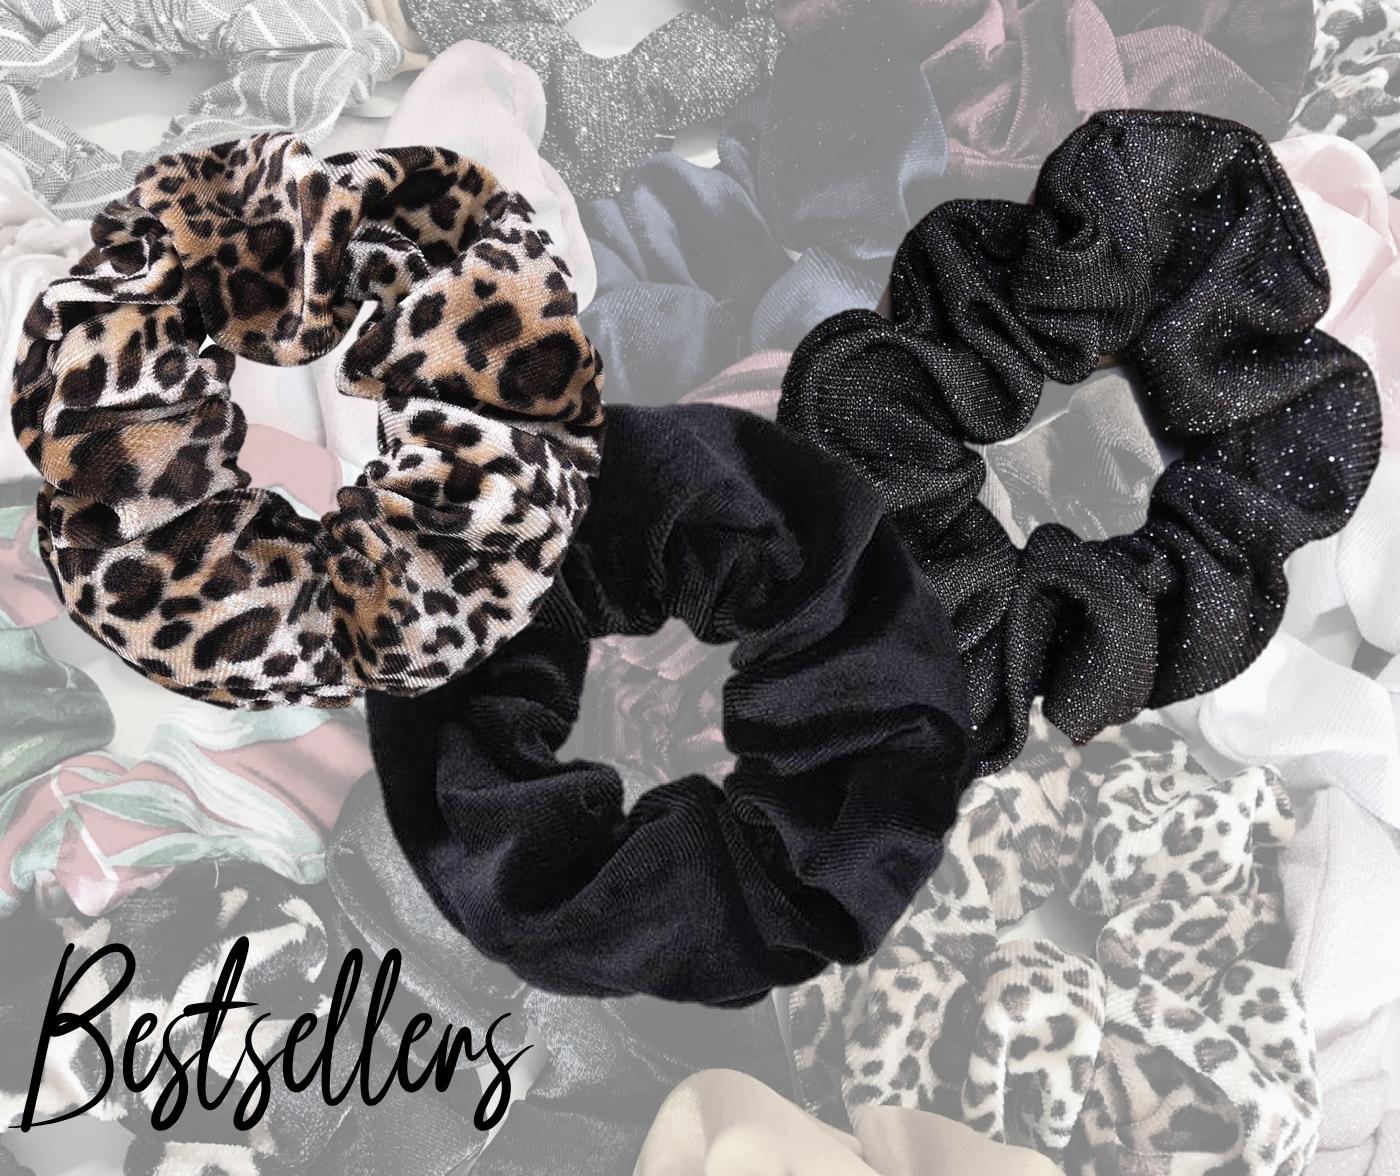 scrunchies-bestseller-zwart-glitter-velvet-luipaard